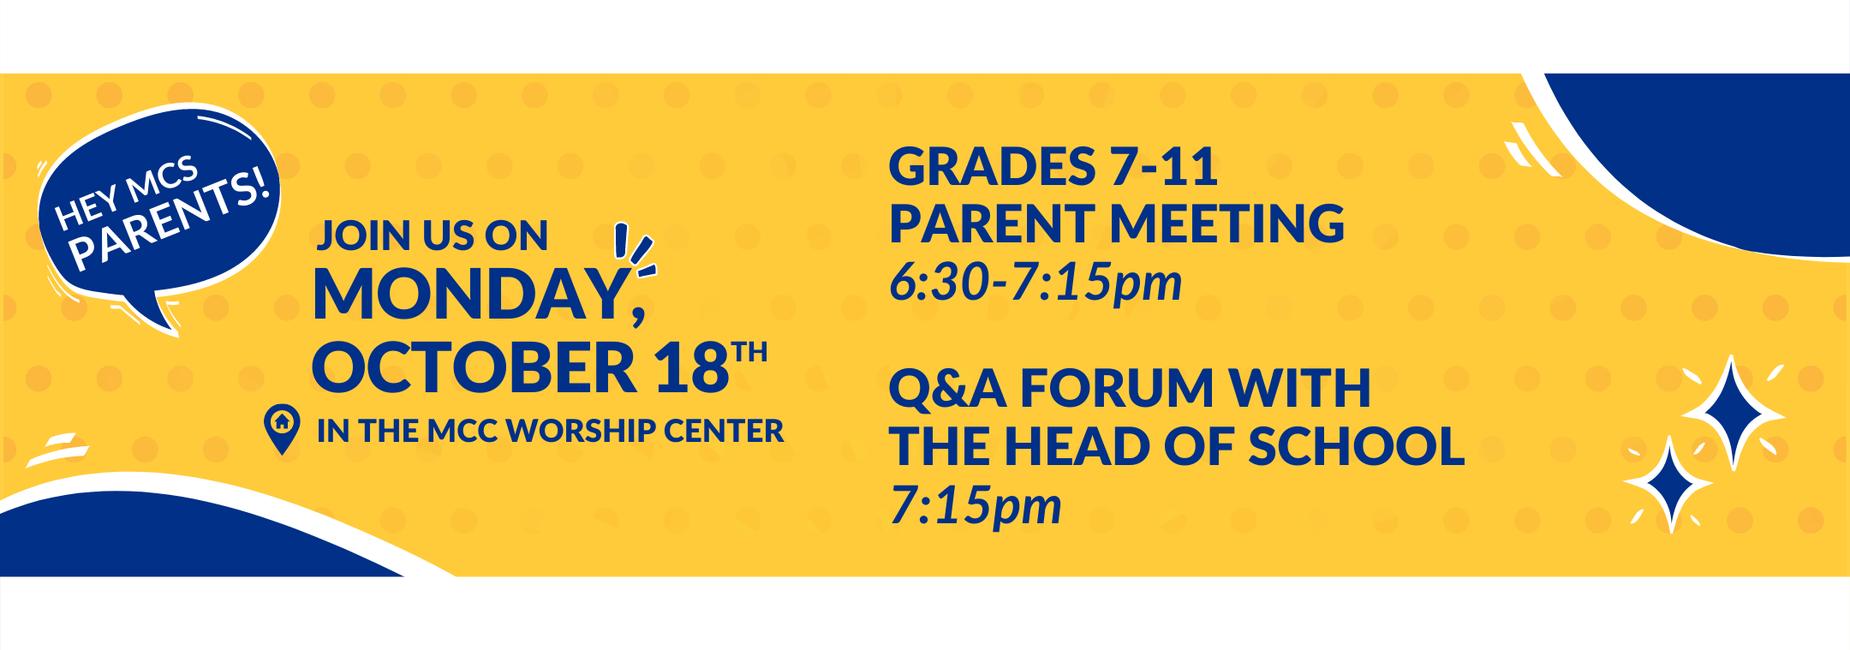 Oct. 18 Parent Meetings